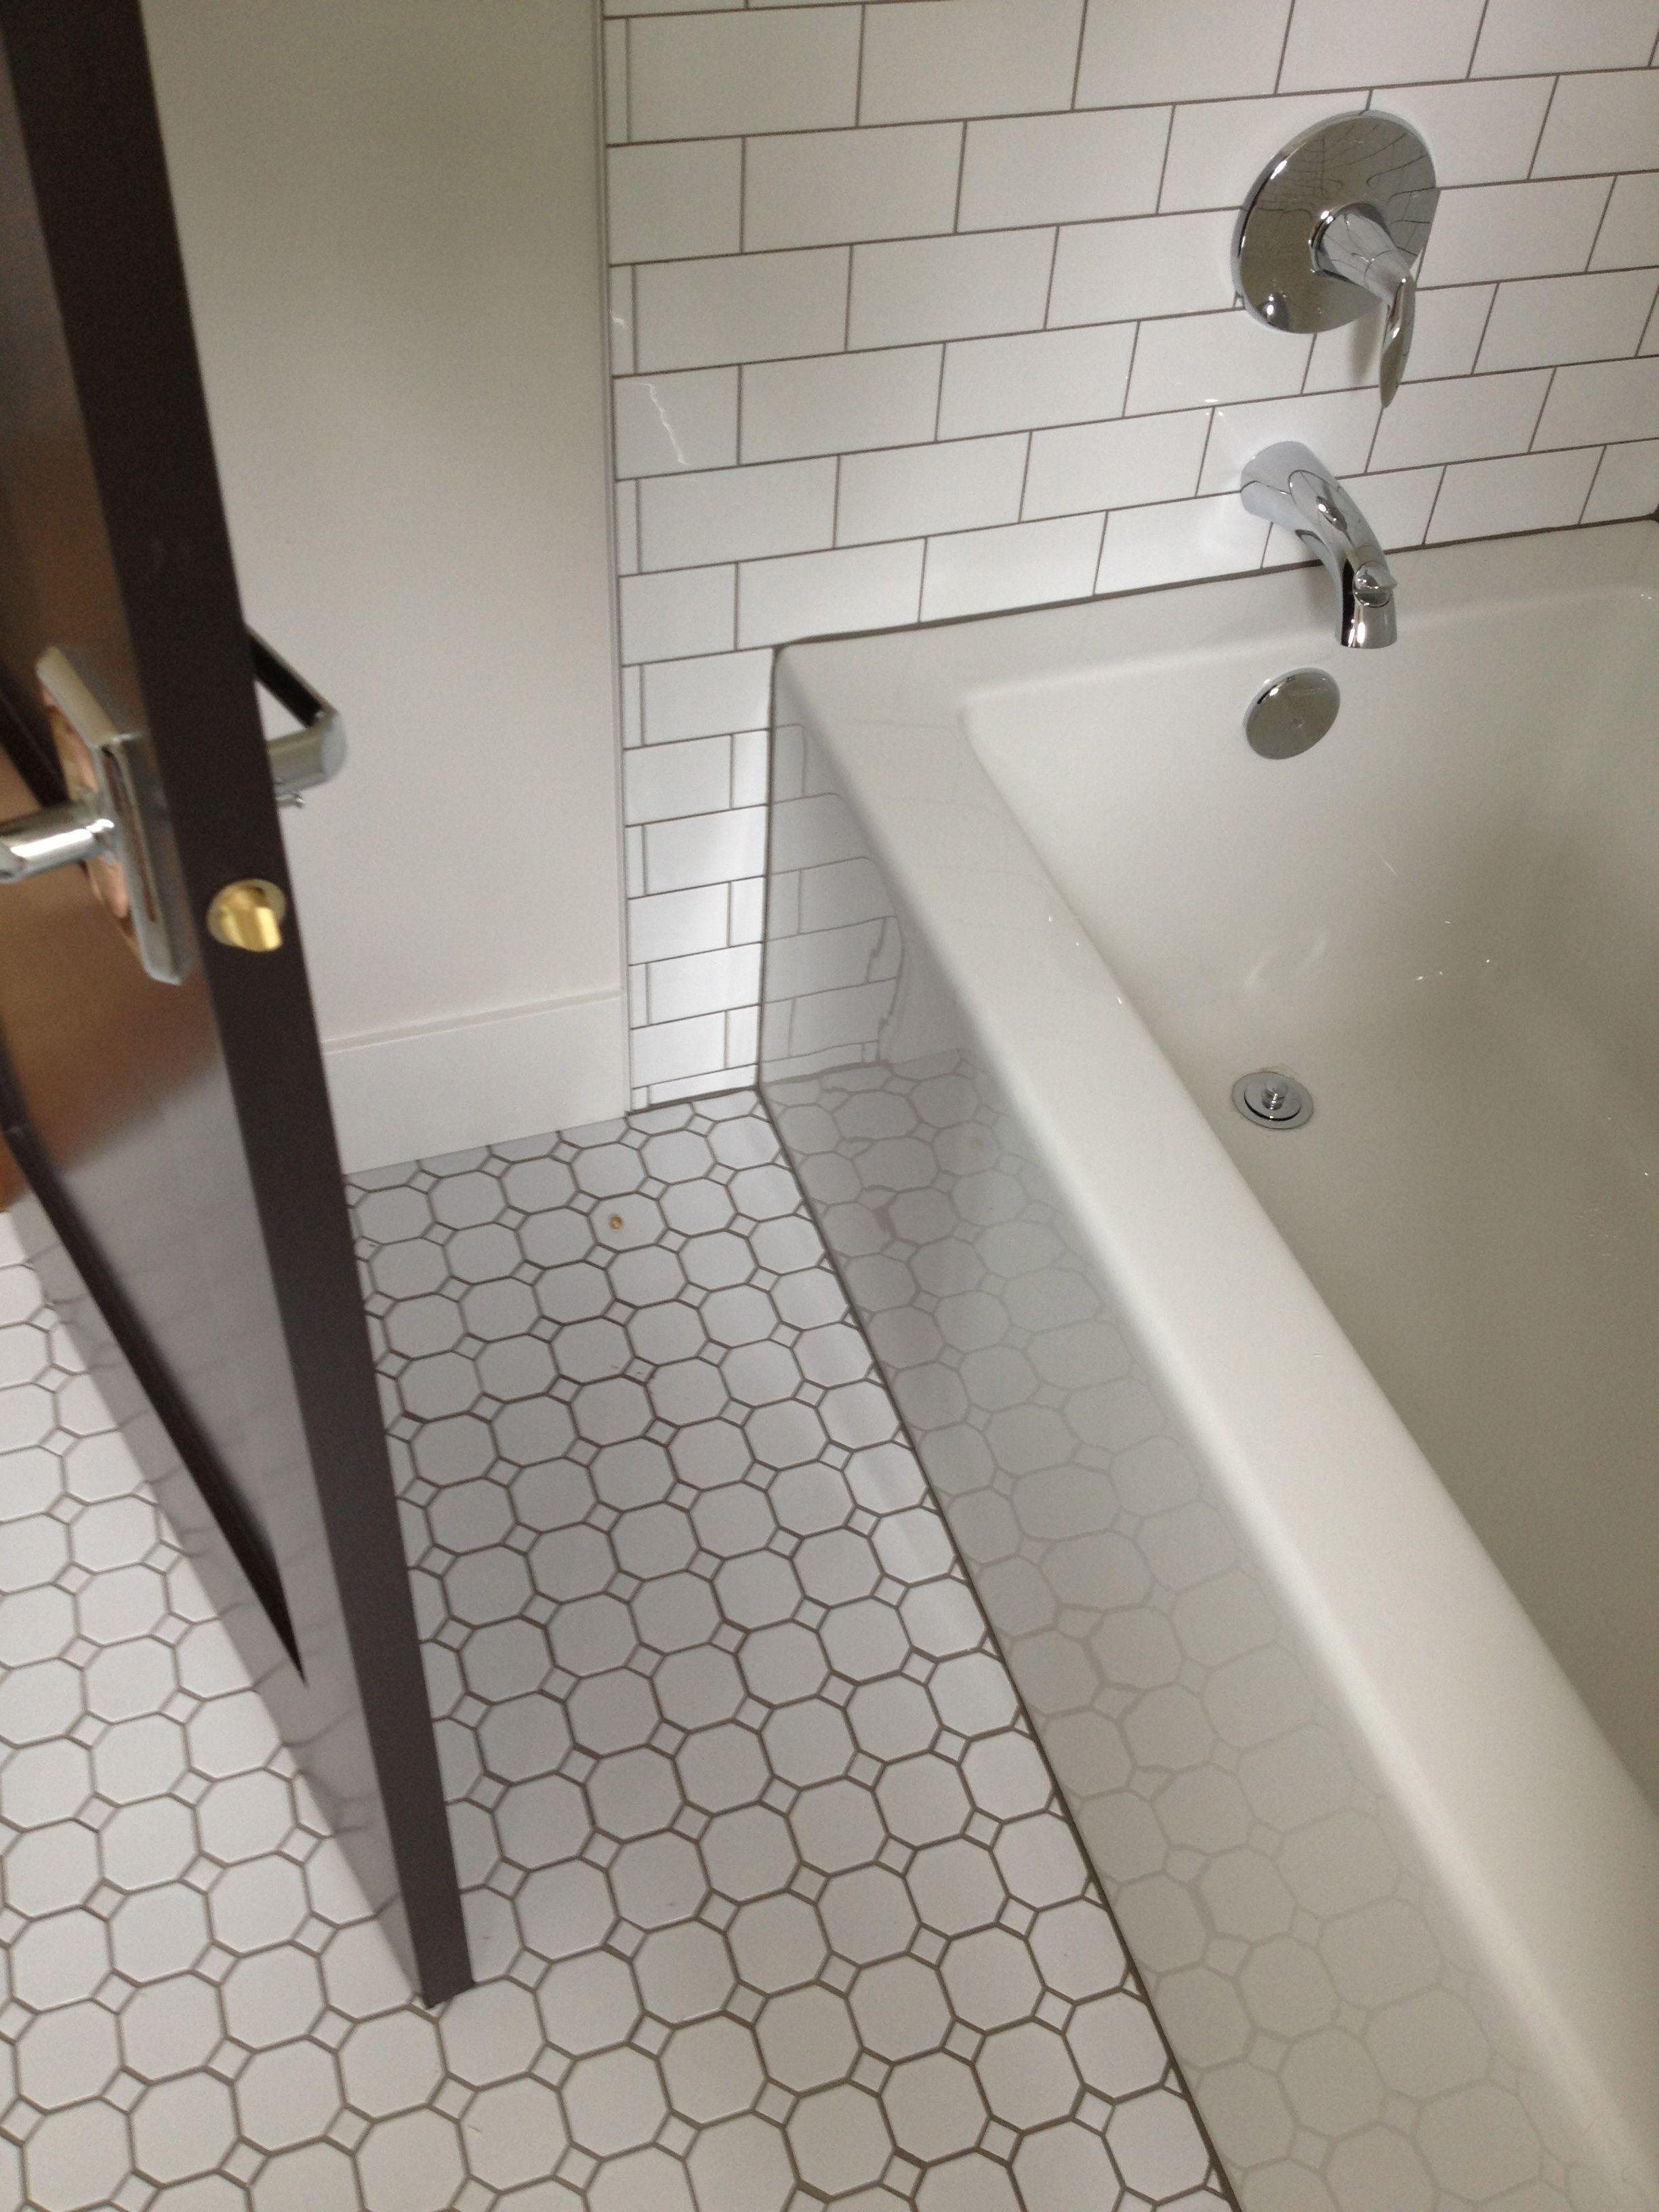 Class Tile Combo Hexagon Tiles With Subway Crisp And Clean Kitchen Decor Apartment Kitchen Design Decor Tile Bathroom